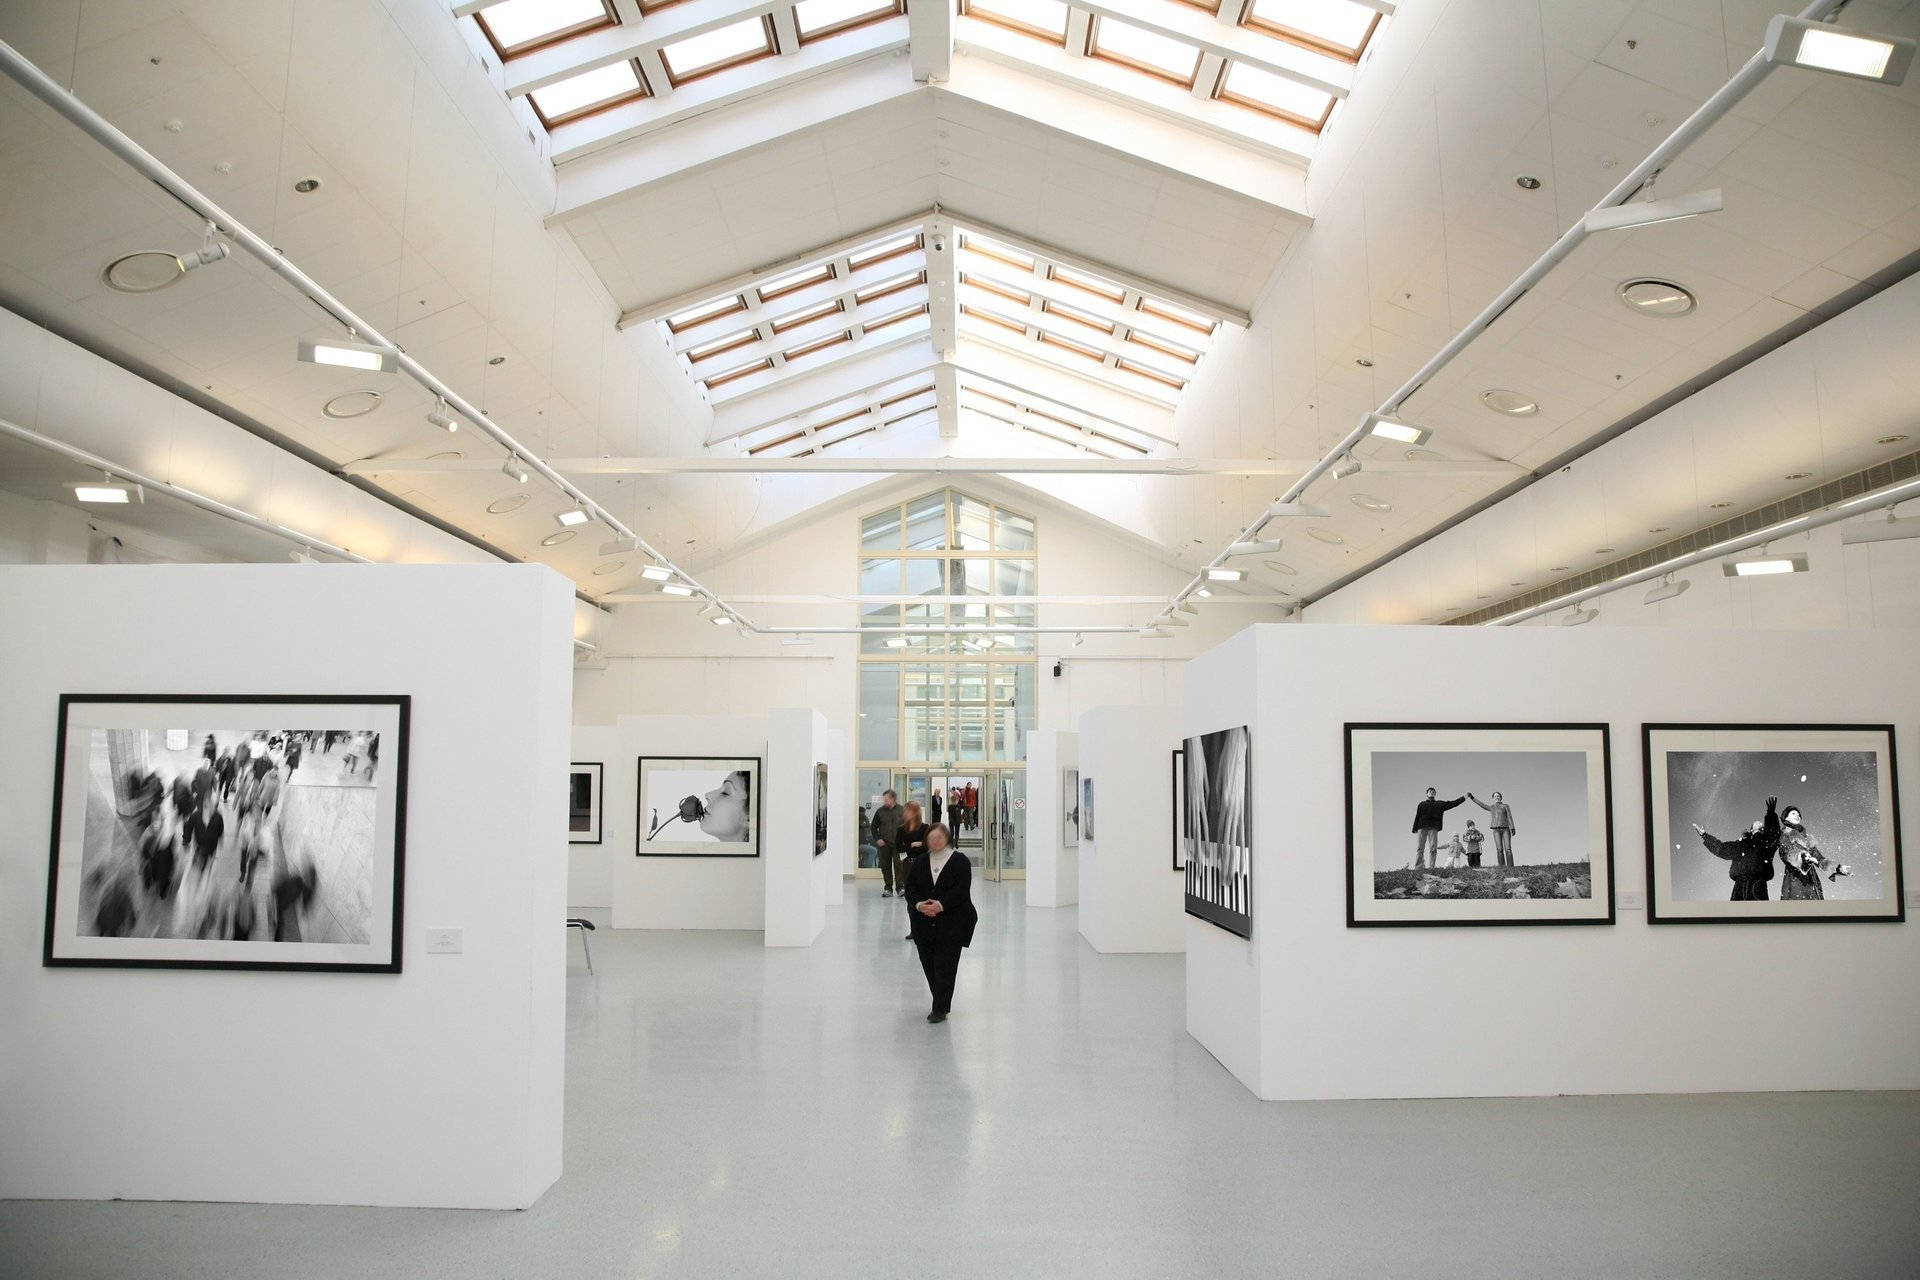 museum with DALI LED panels